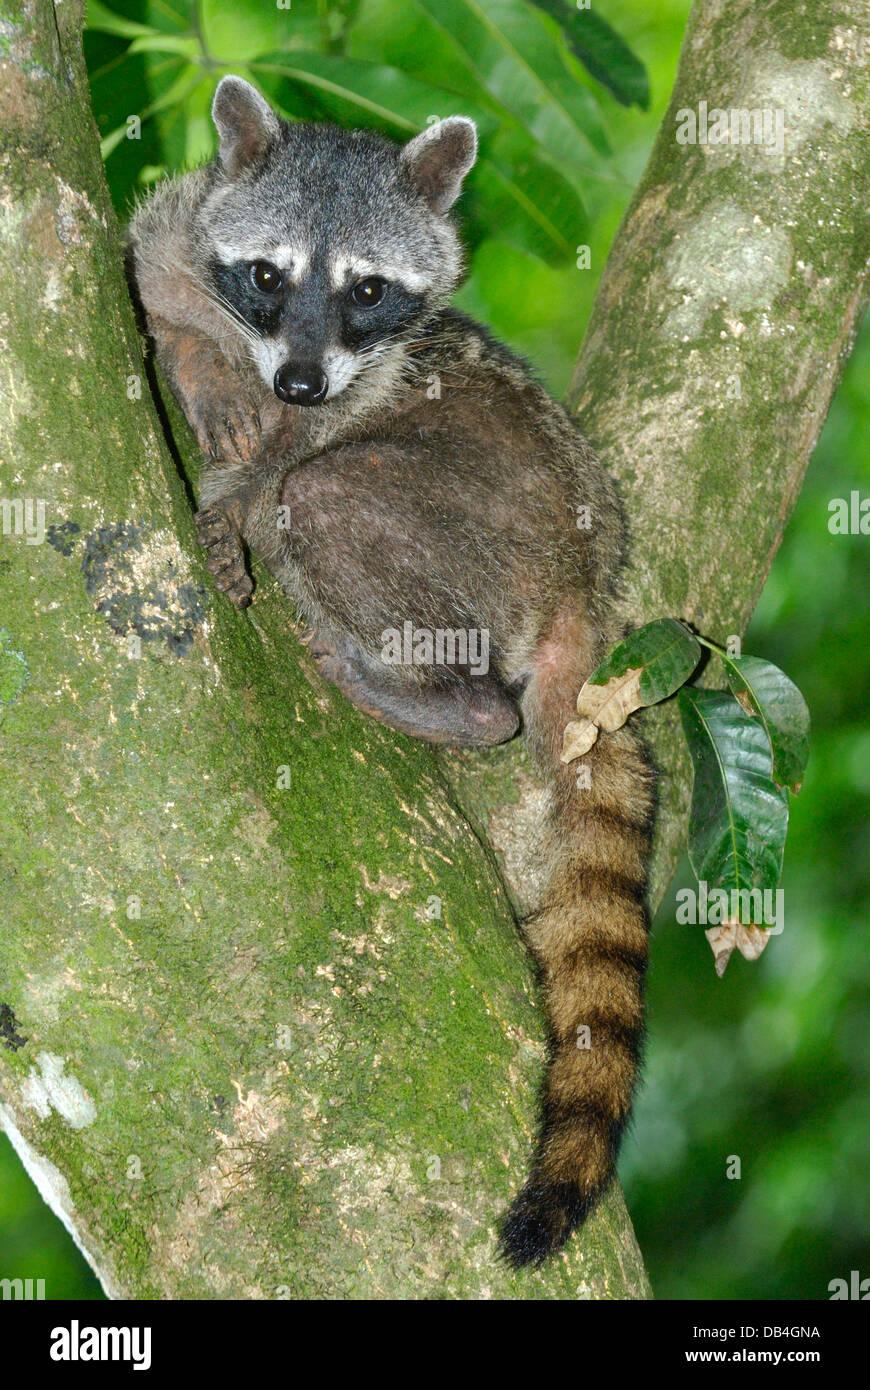 Manger du crabe Raccooon (Procyon cancrivorus) dans la région de Parc National Manuel Antonio, Costa Rica Photo Stock